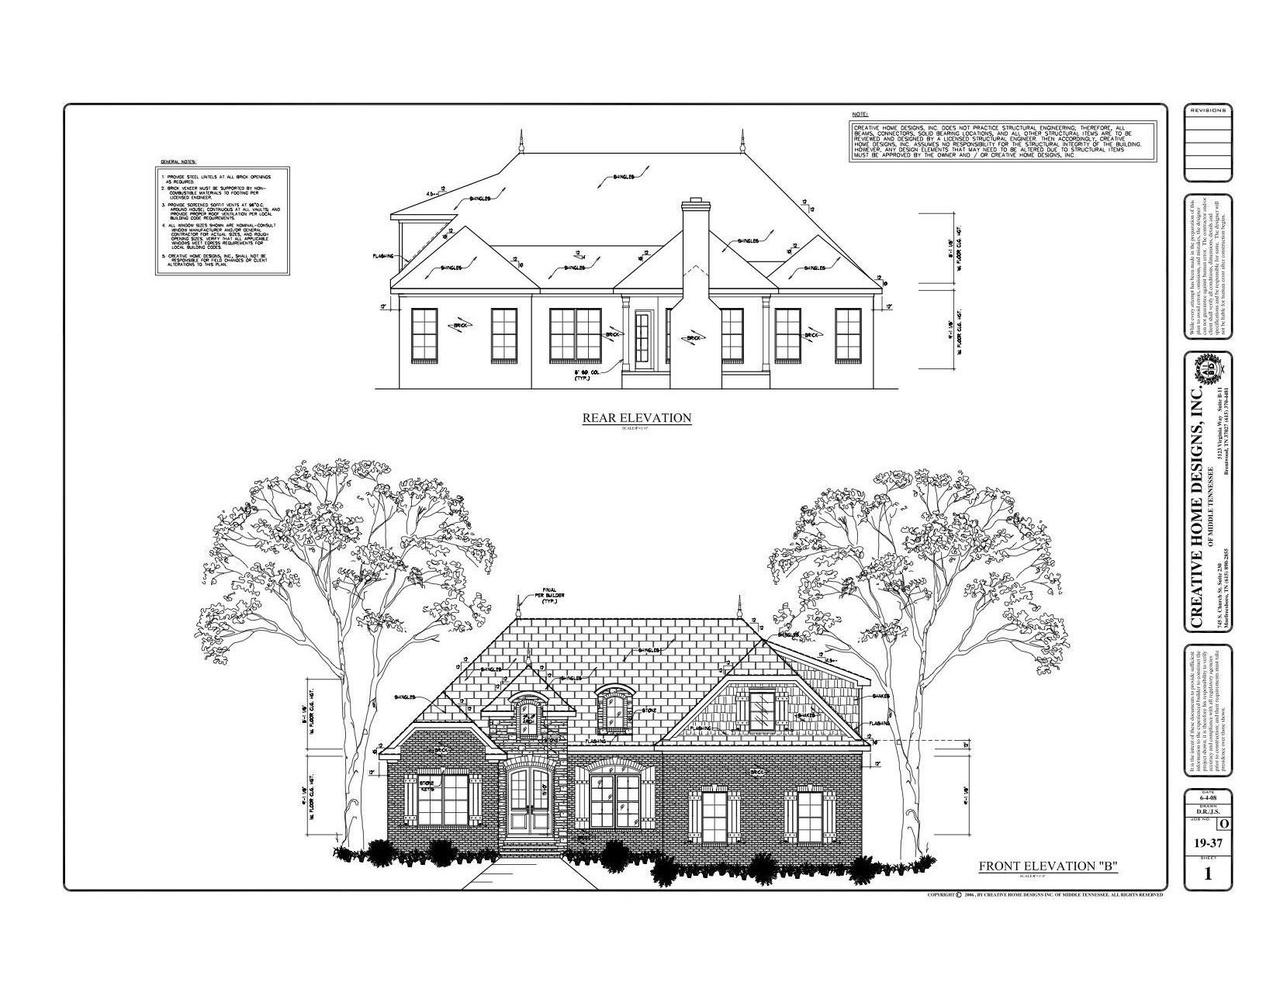 creative home designs inc   home design